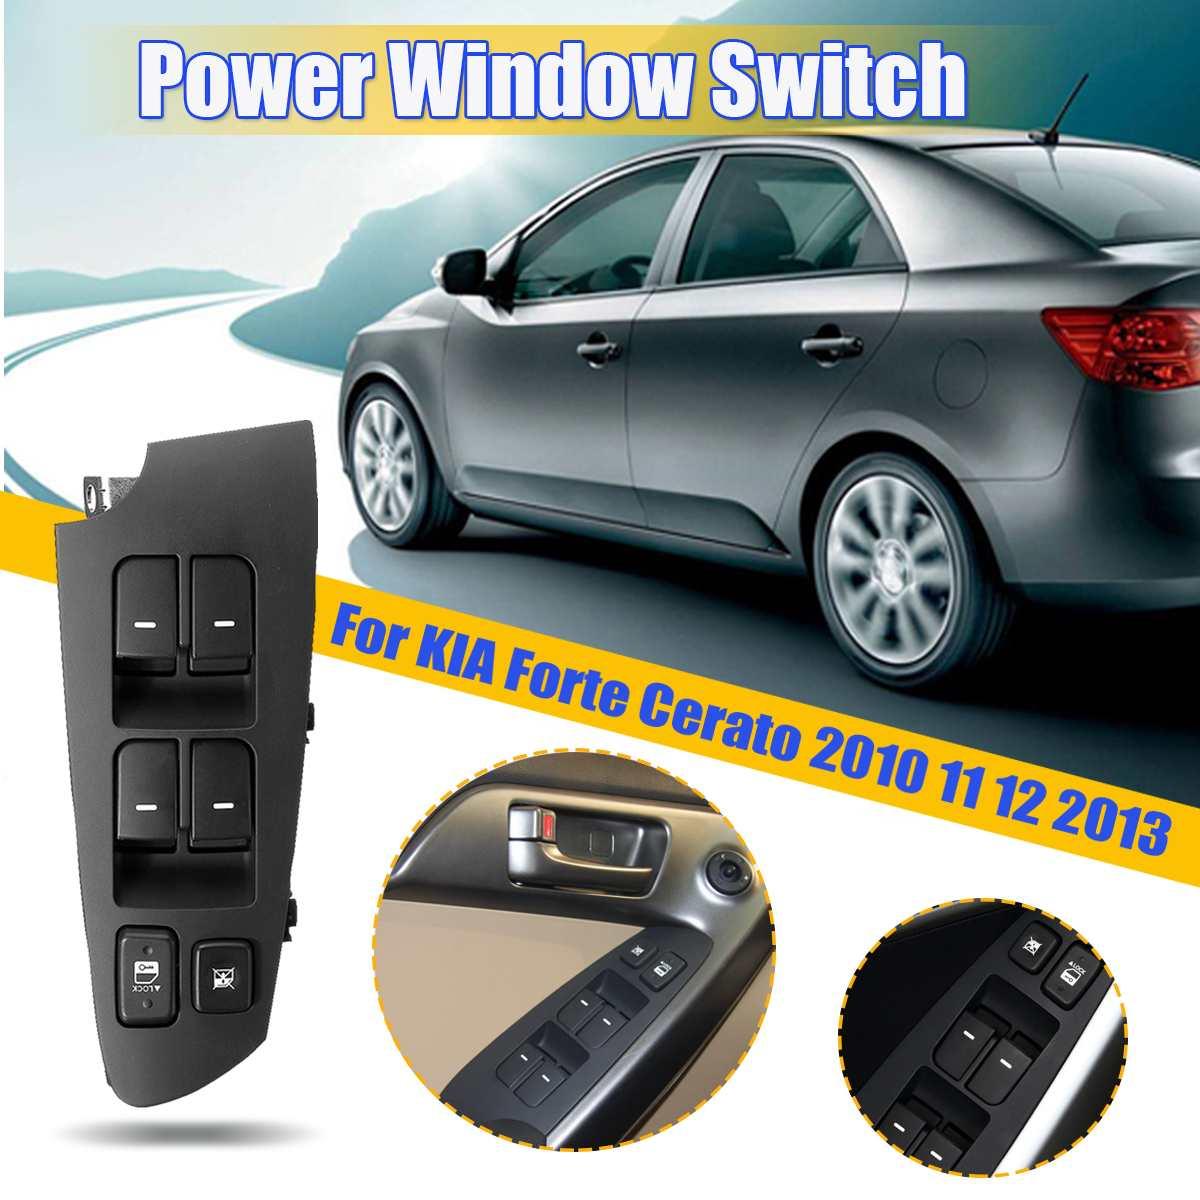 Genuine Power Window Switch passenger Side For KIA Forte Cerato Koup 2010 2013